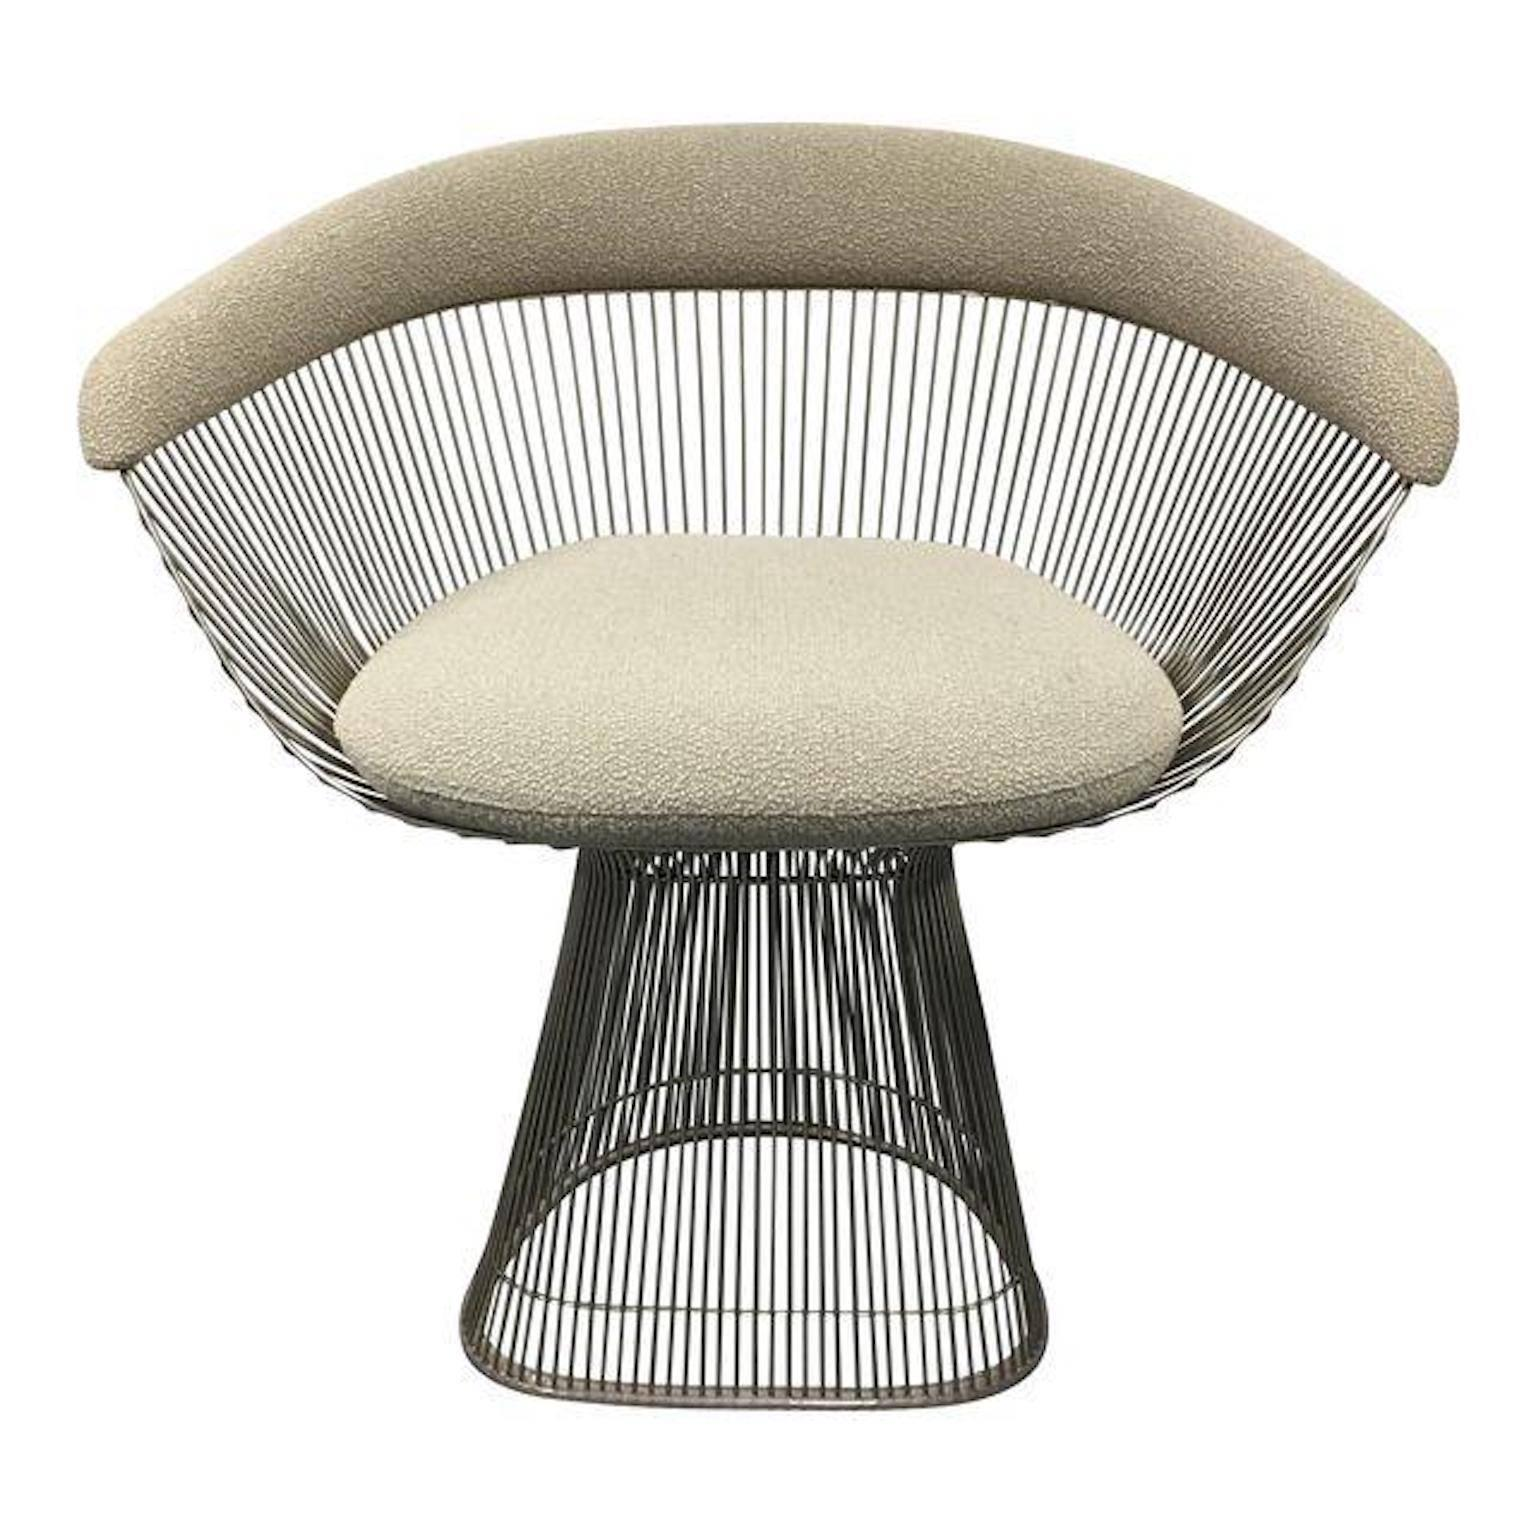 Knoll Platner Armchair Designed By Warren Platner 1